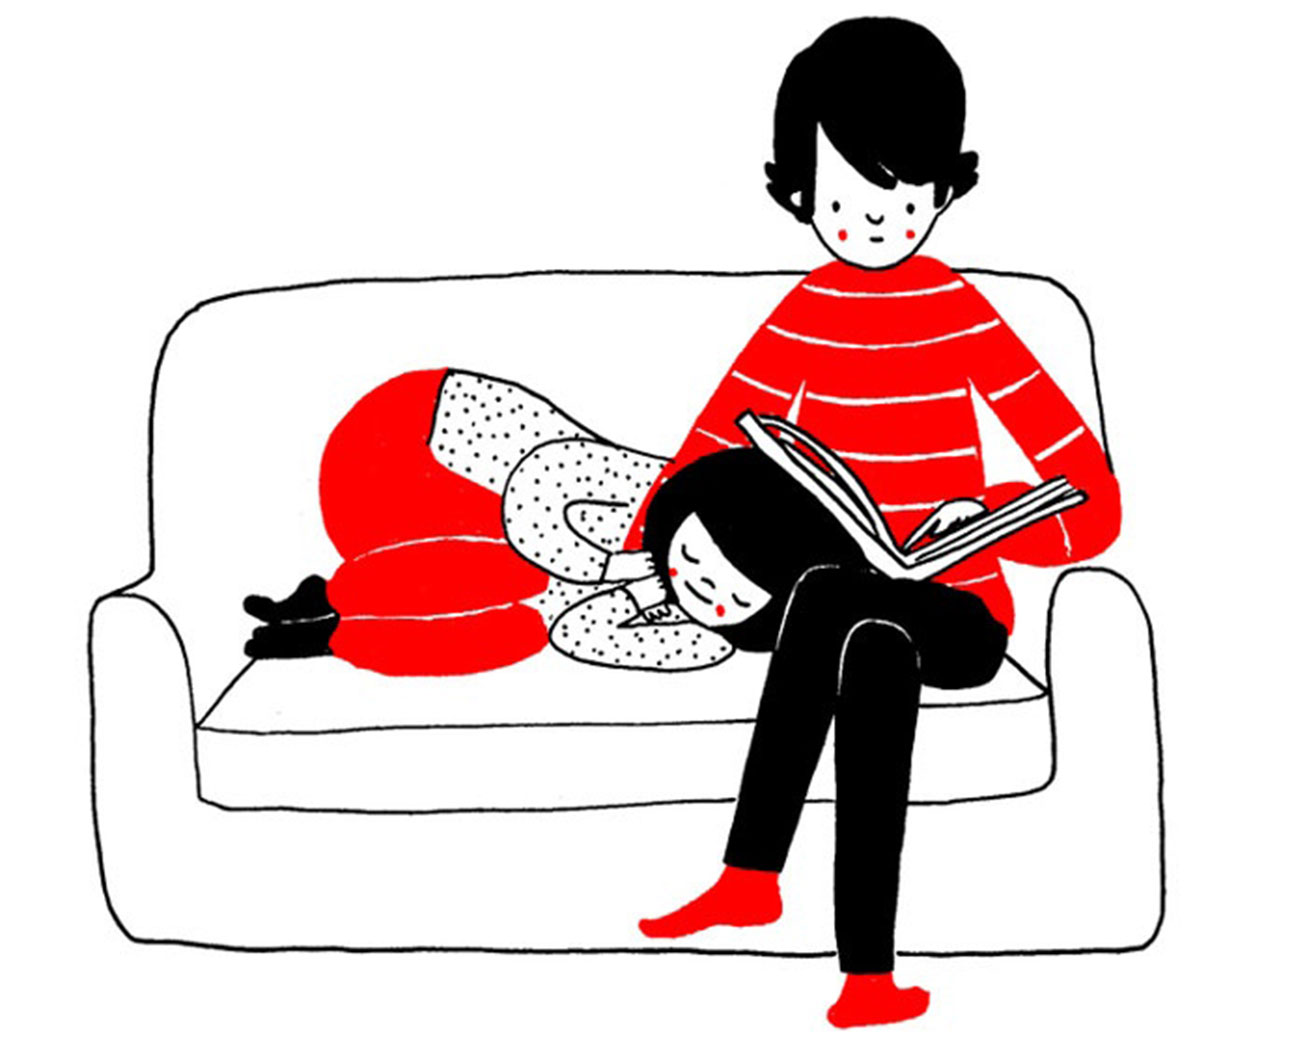 Philippa-Rice_Everyday-Love_Comics_2